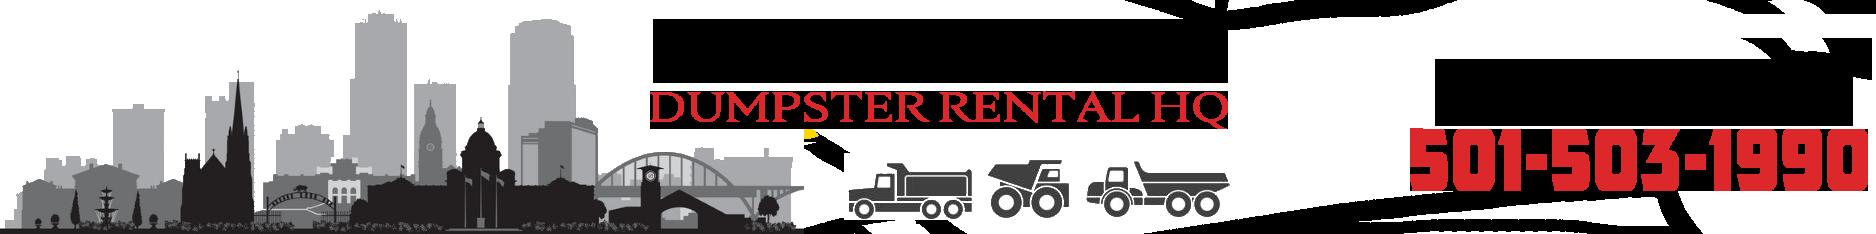 Little Rock Dumpster Rental HQ